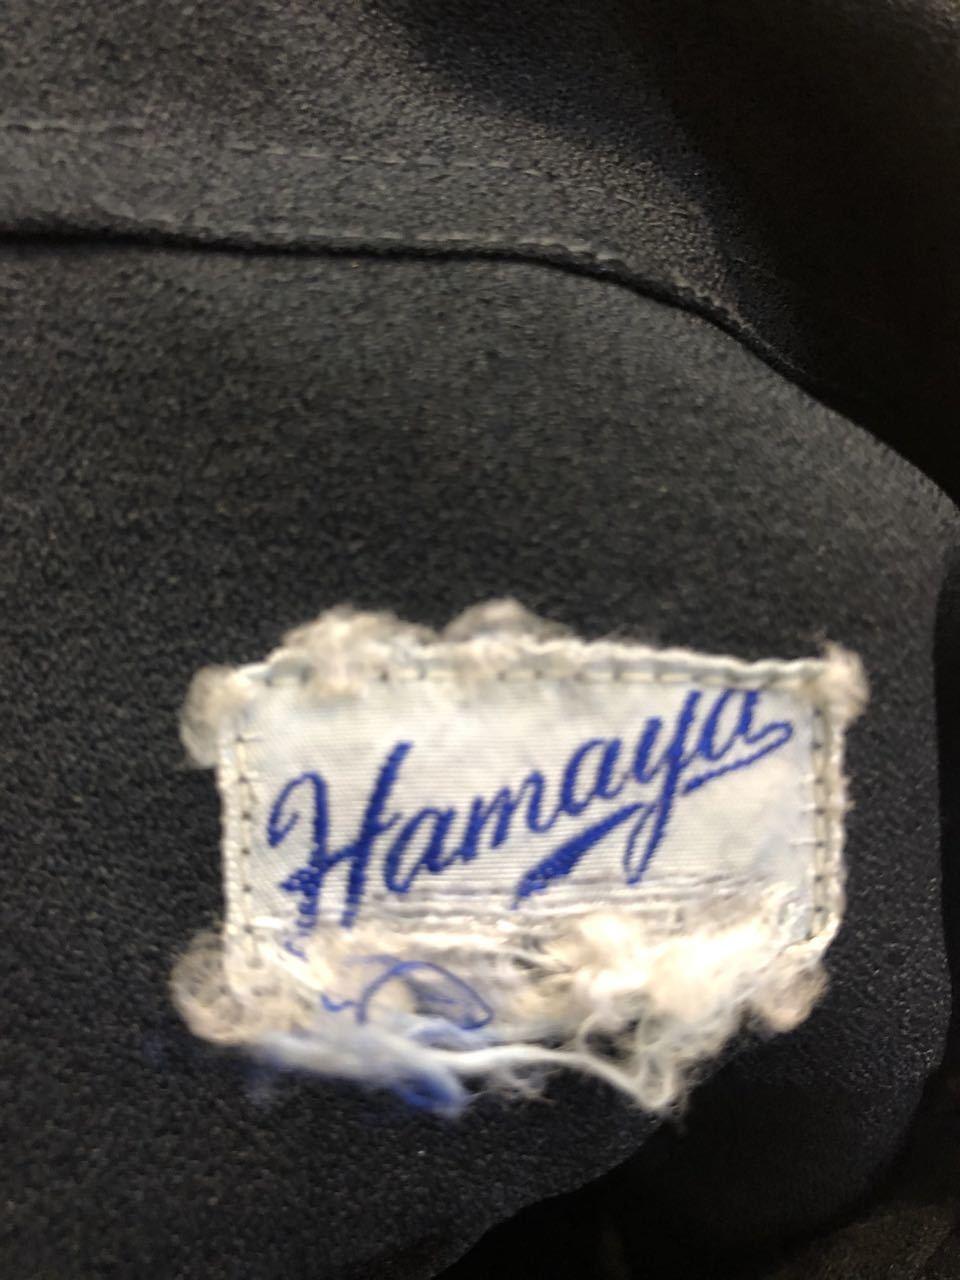 8月1日(土)入荷!70s U.S ARMY HAMAYA YOKOHAMA  CAMP ZAMA Suvenior bowling shirt!_c0144020_13371103.jpg